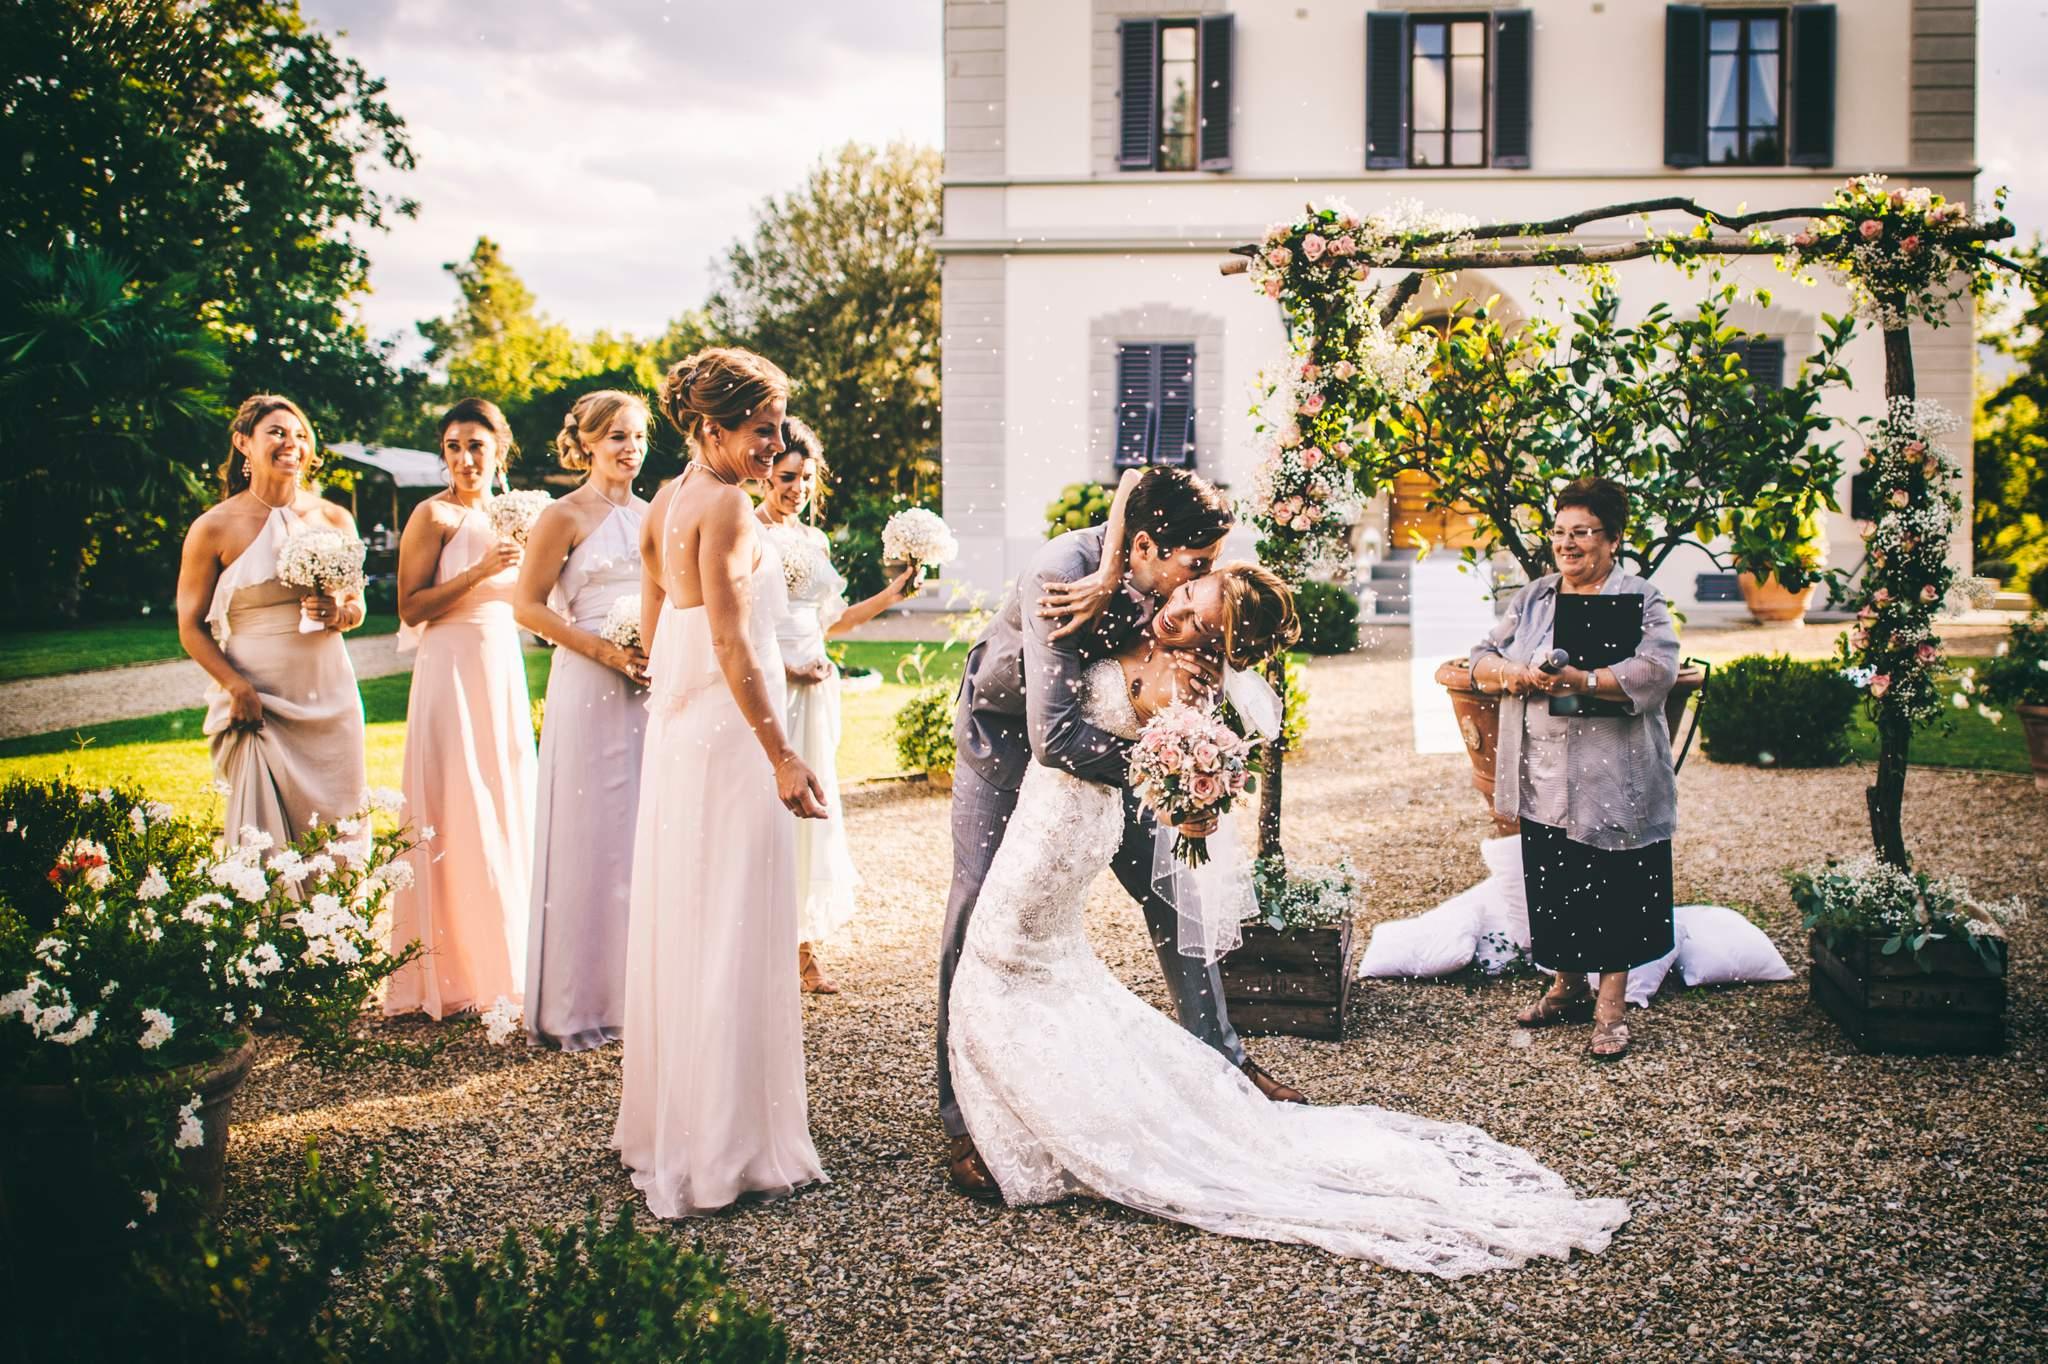 Matrimonio Toscana : Matrimonio giuliana kian villa teresa chianti toscana